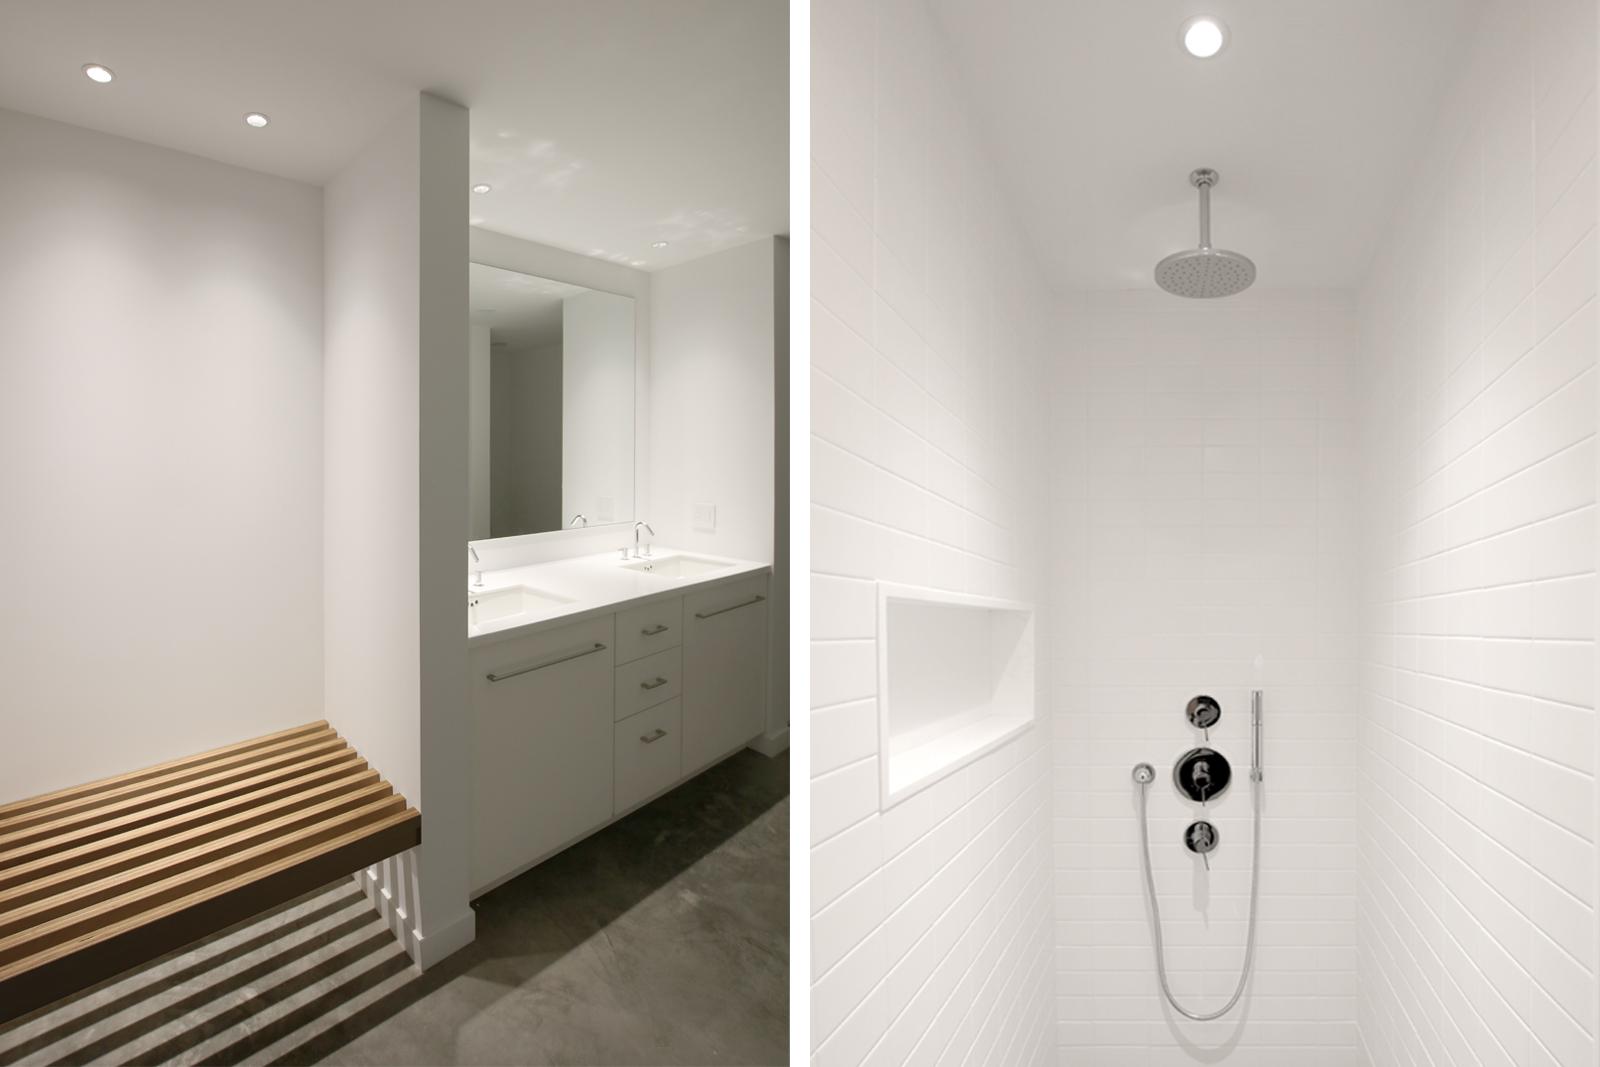 24-res4-resolution-4-architecture-modern-modular-house-prefab-home-north-fork-bluff-house-interior-basement-bathroom-shower-bench.jpg